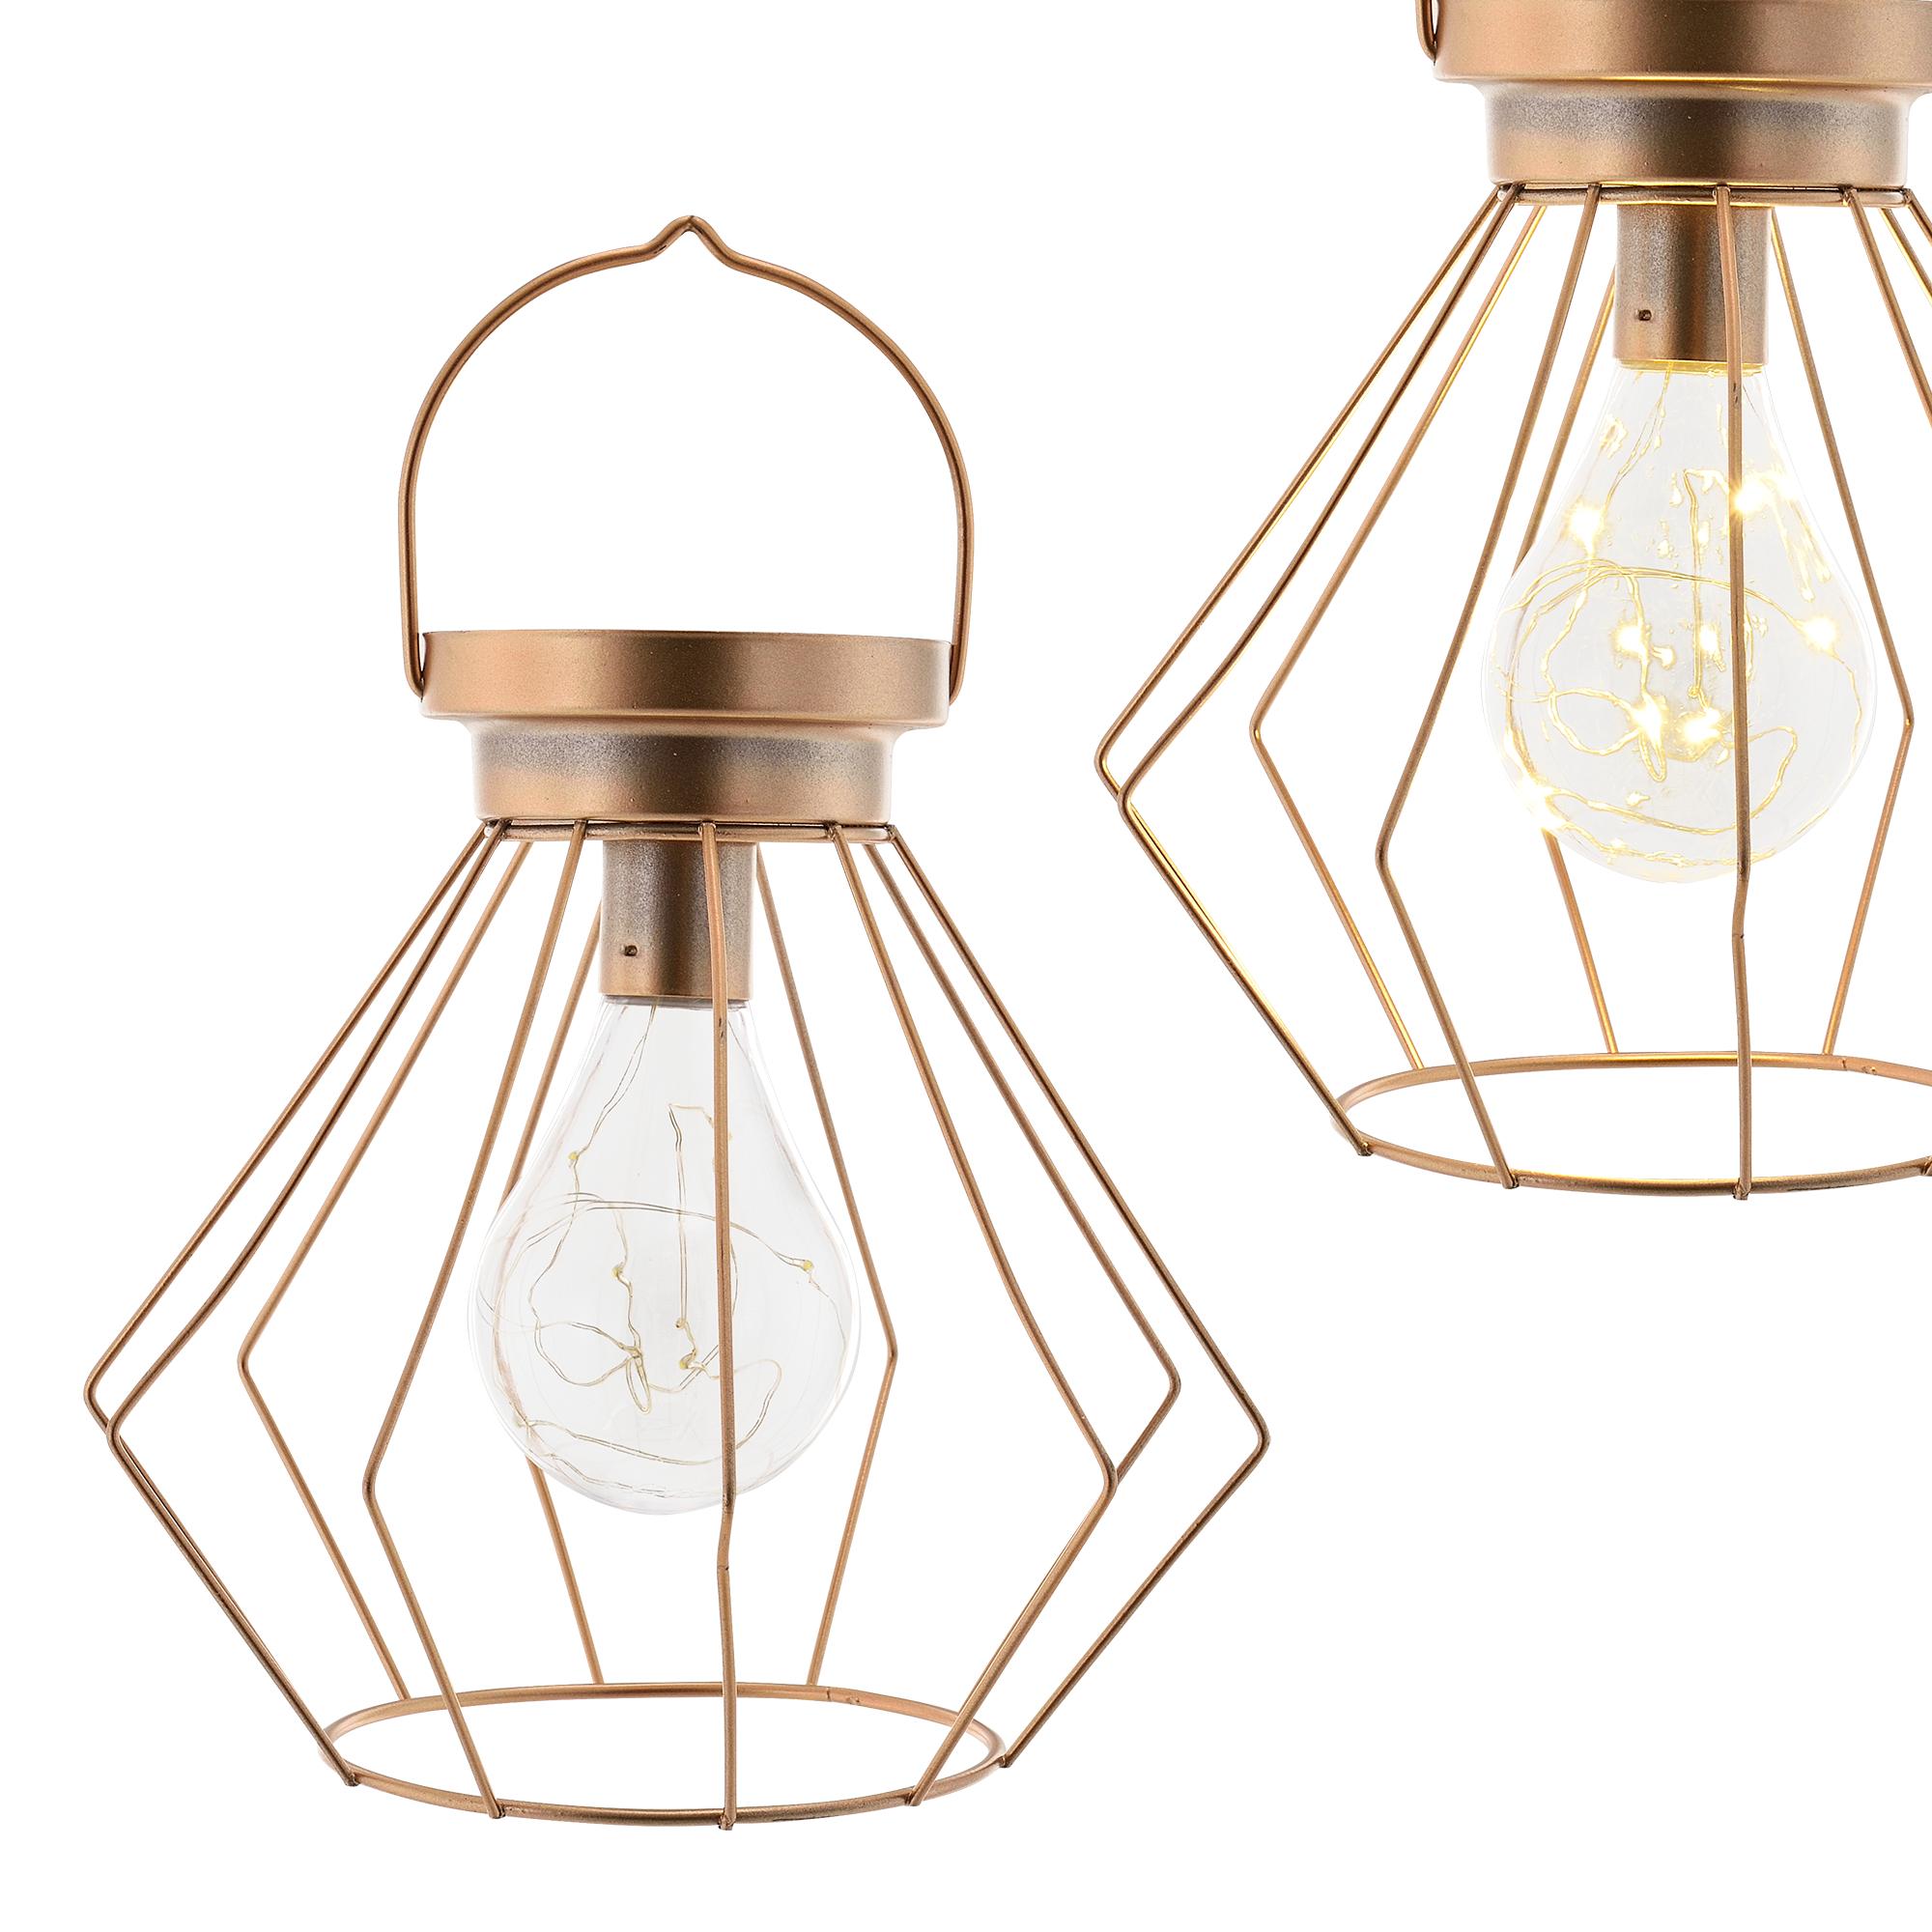 Dekoleuchte dekolampe h ngelampe tischlampe for Tischlampe design